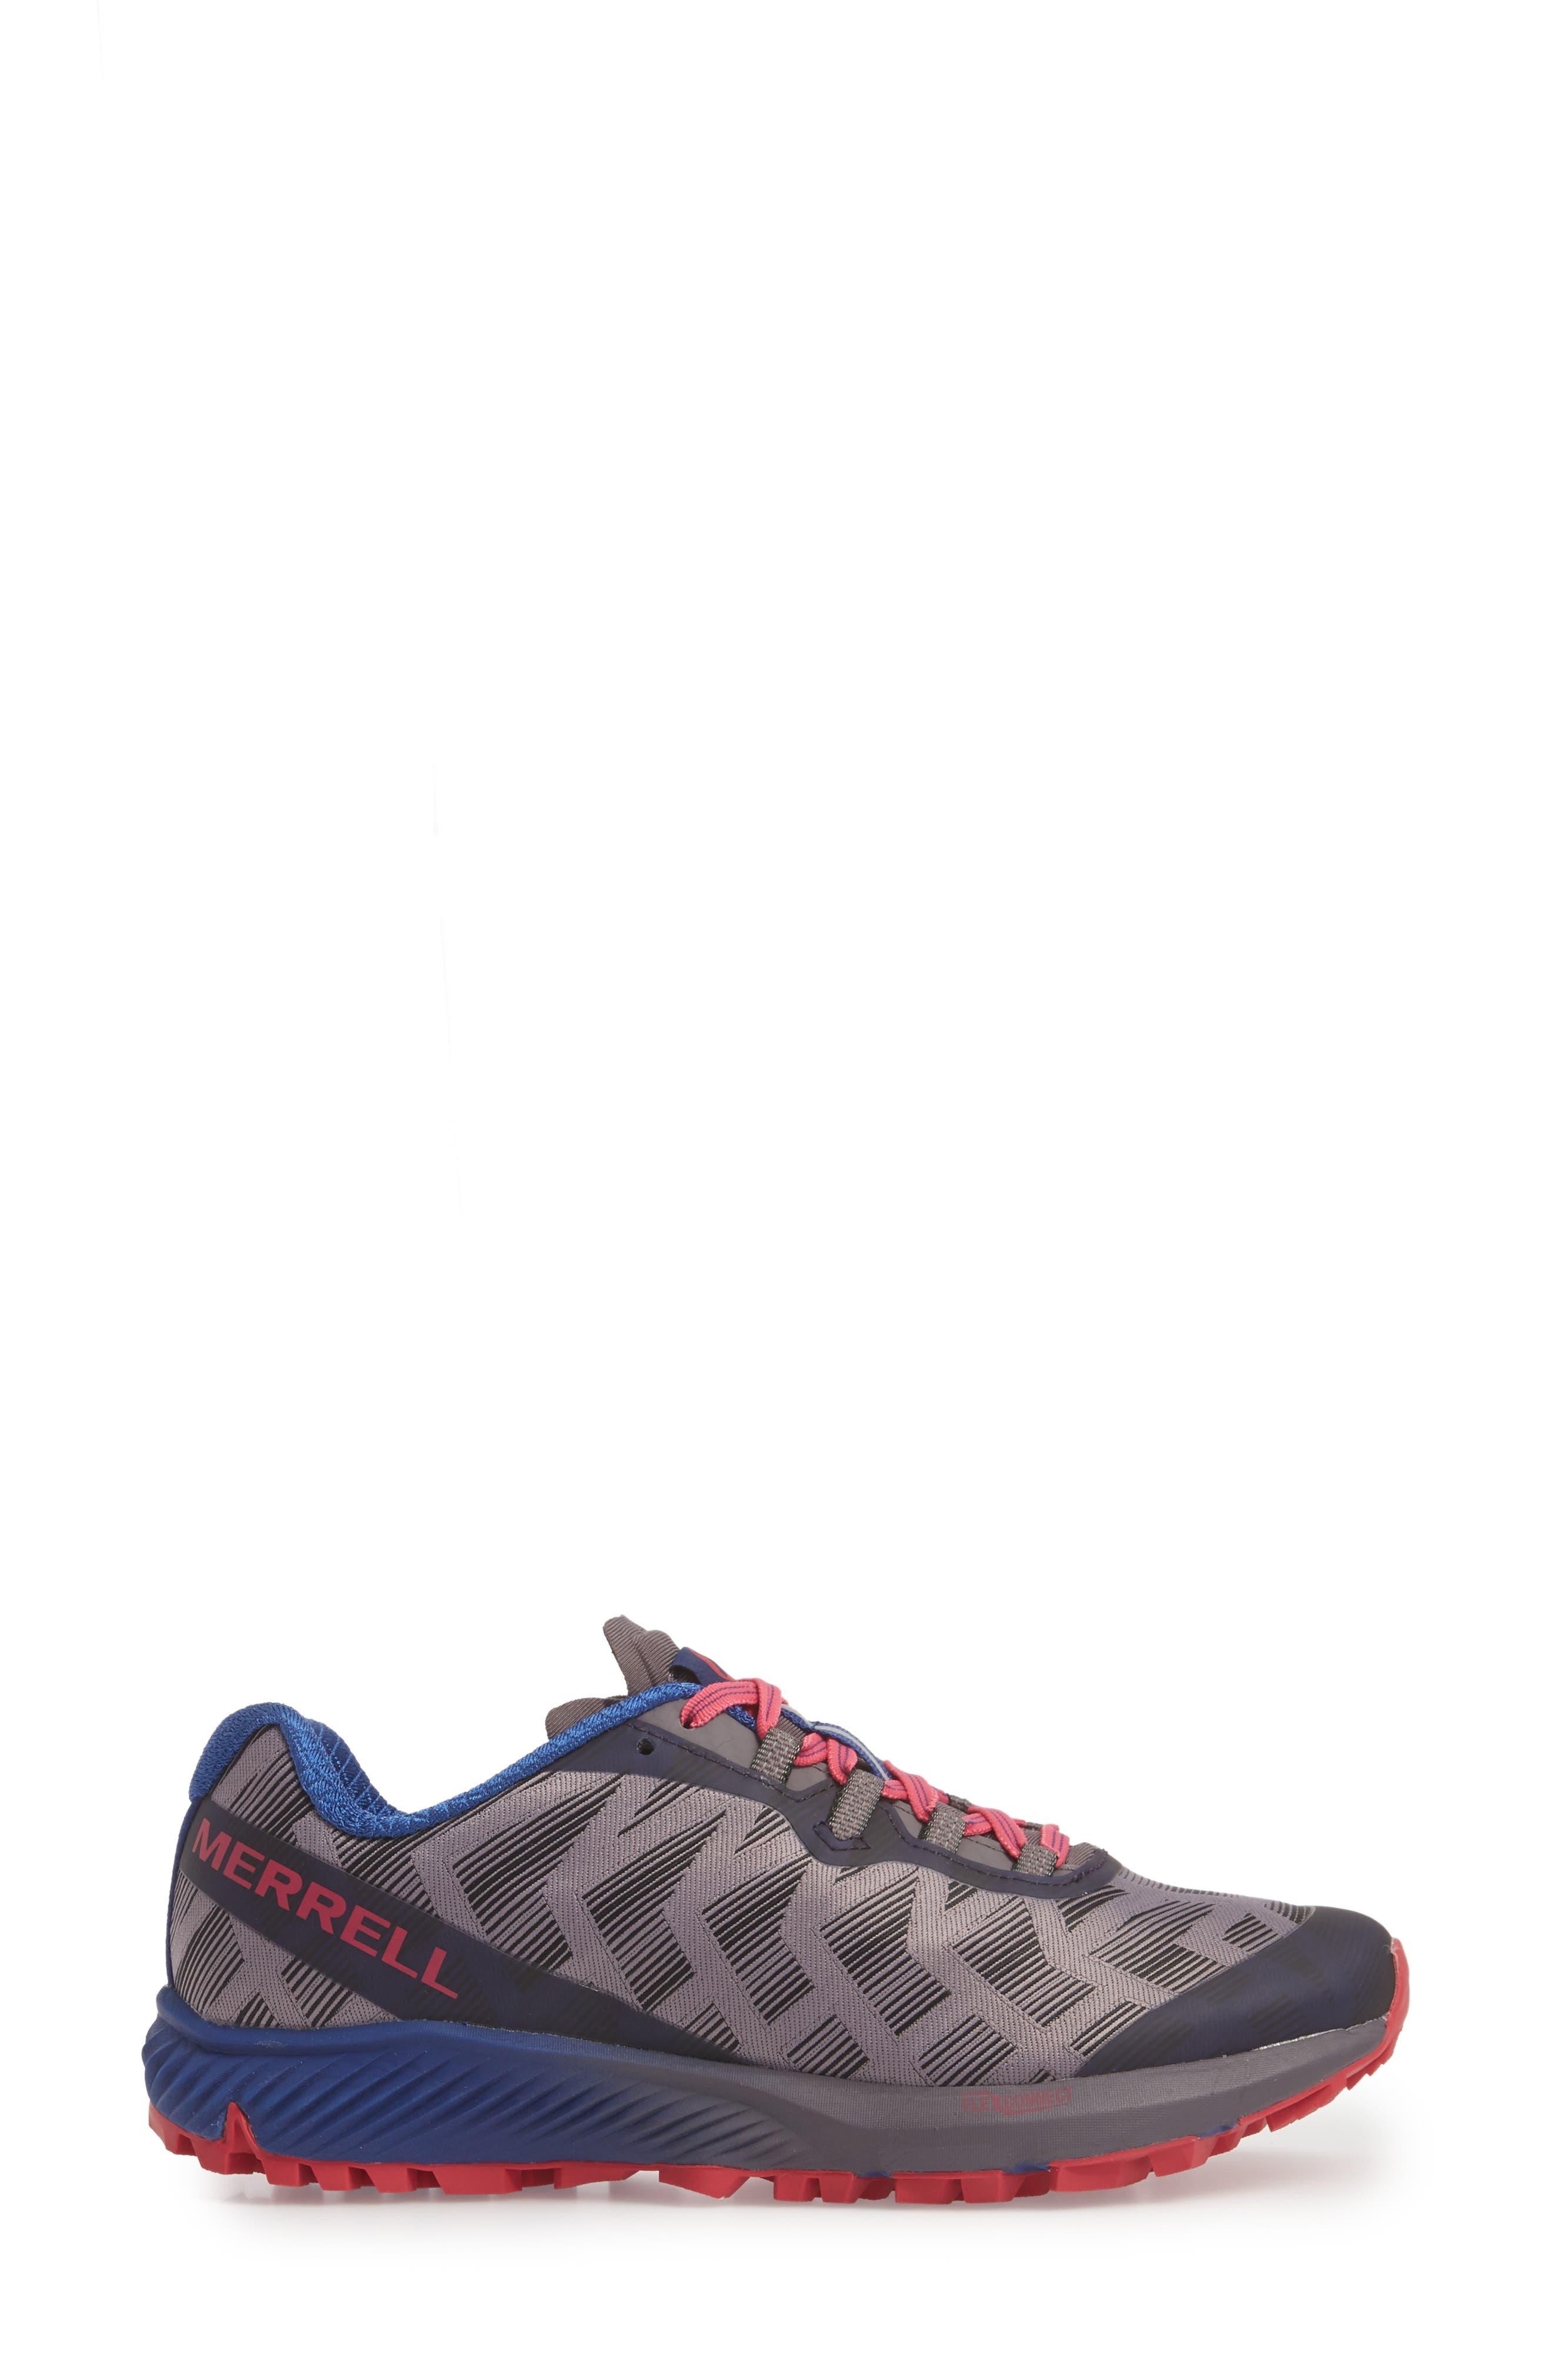 Agility Synthesis Flex Sneaker,                             Alternate thumbnail 3, color,                             SHARK FABRIC